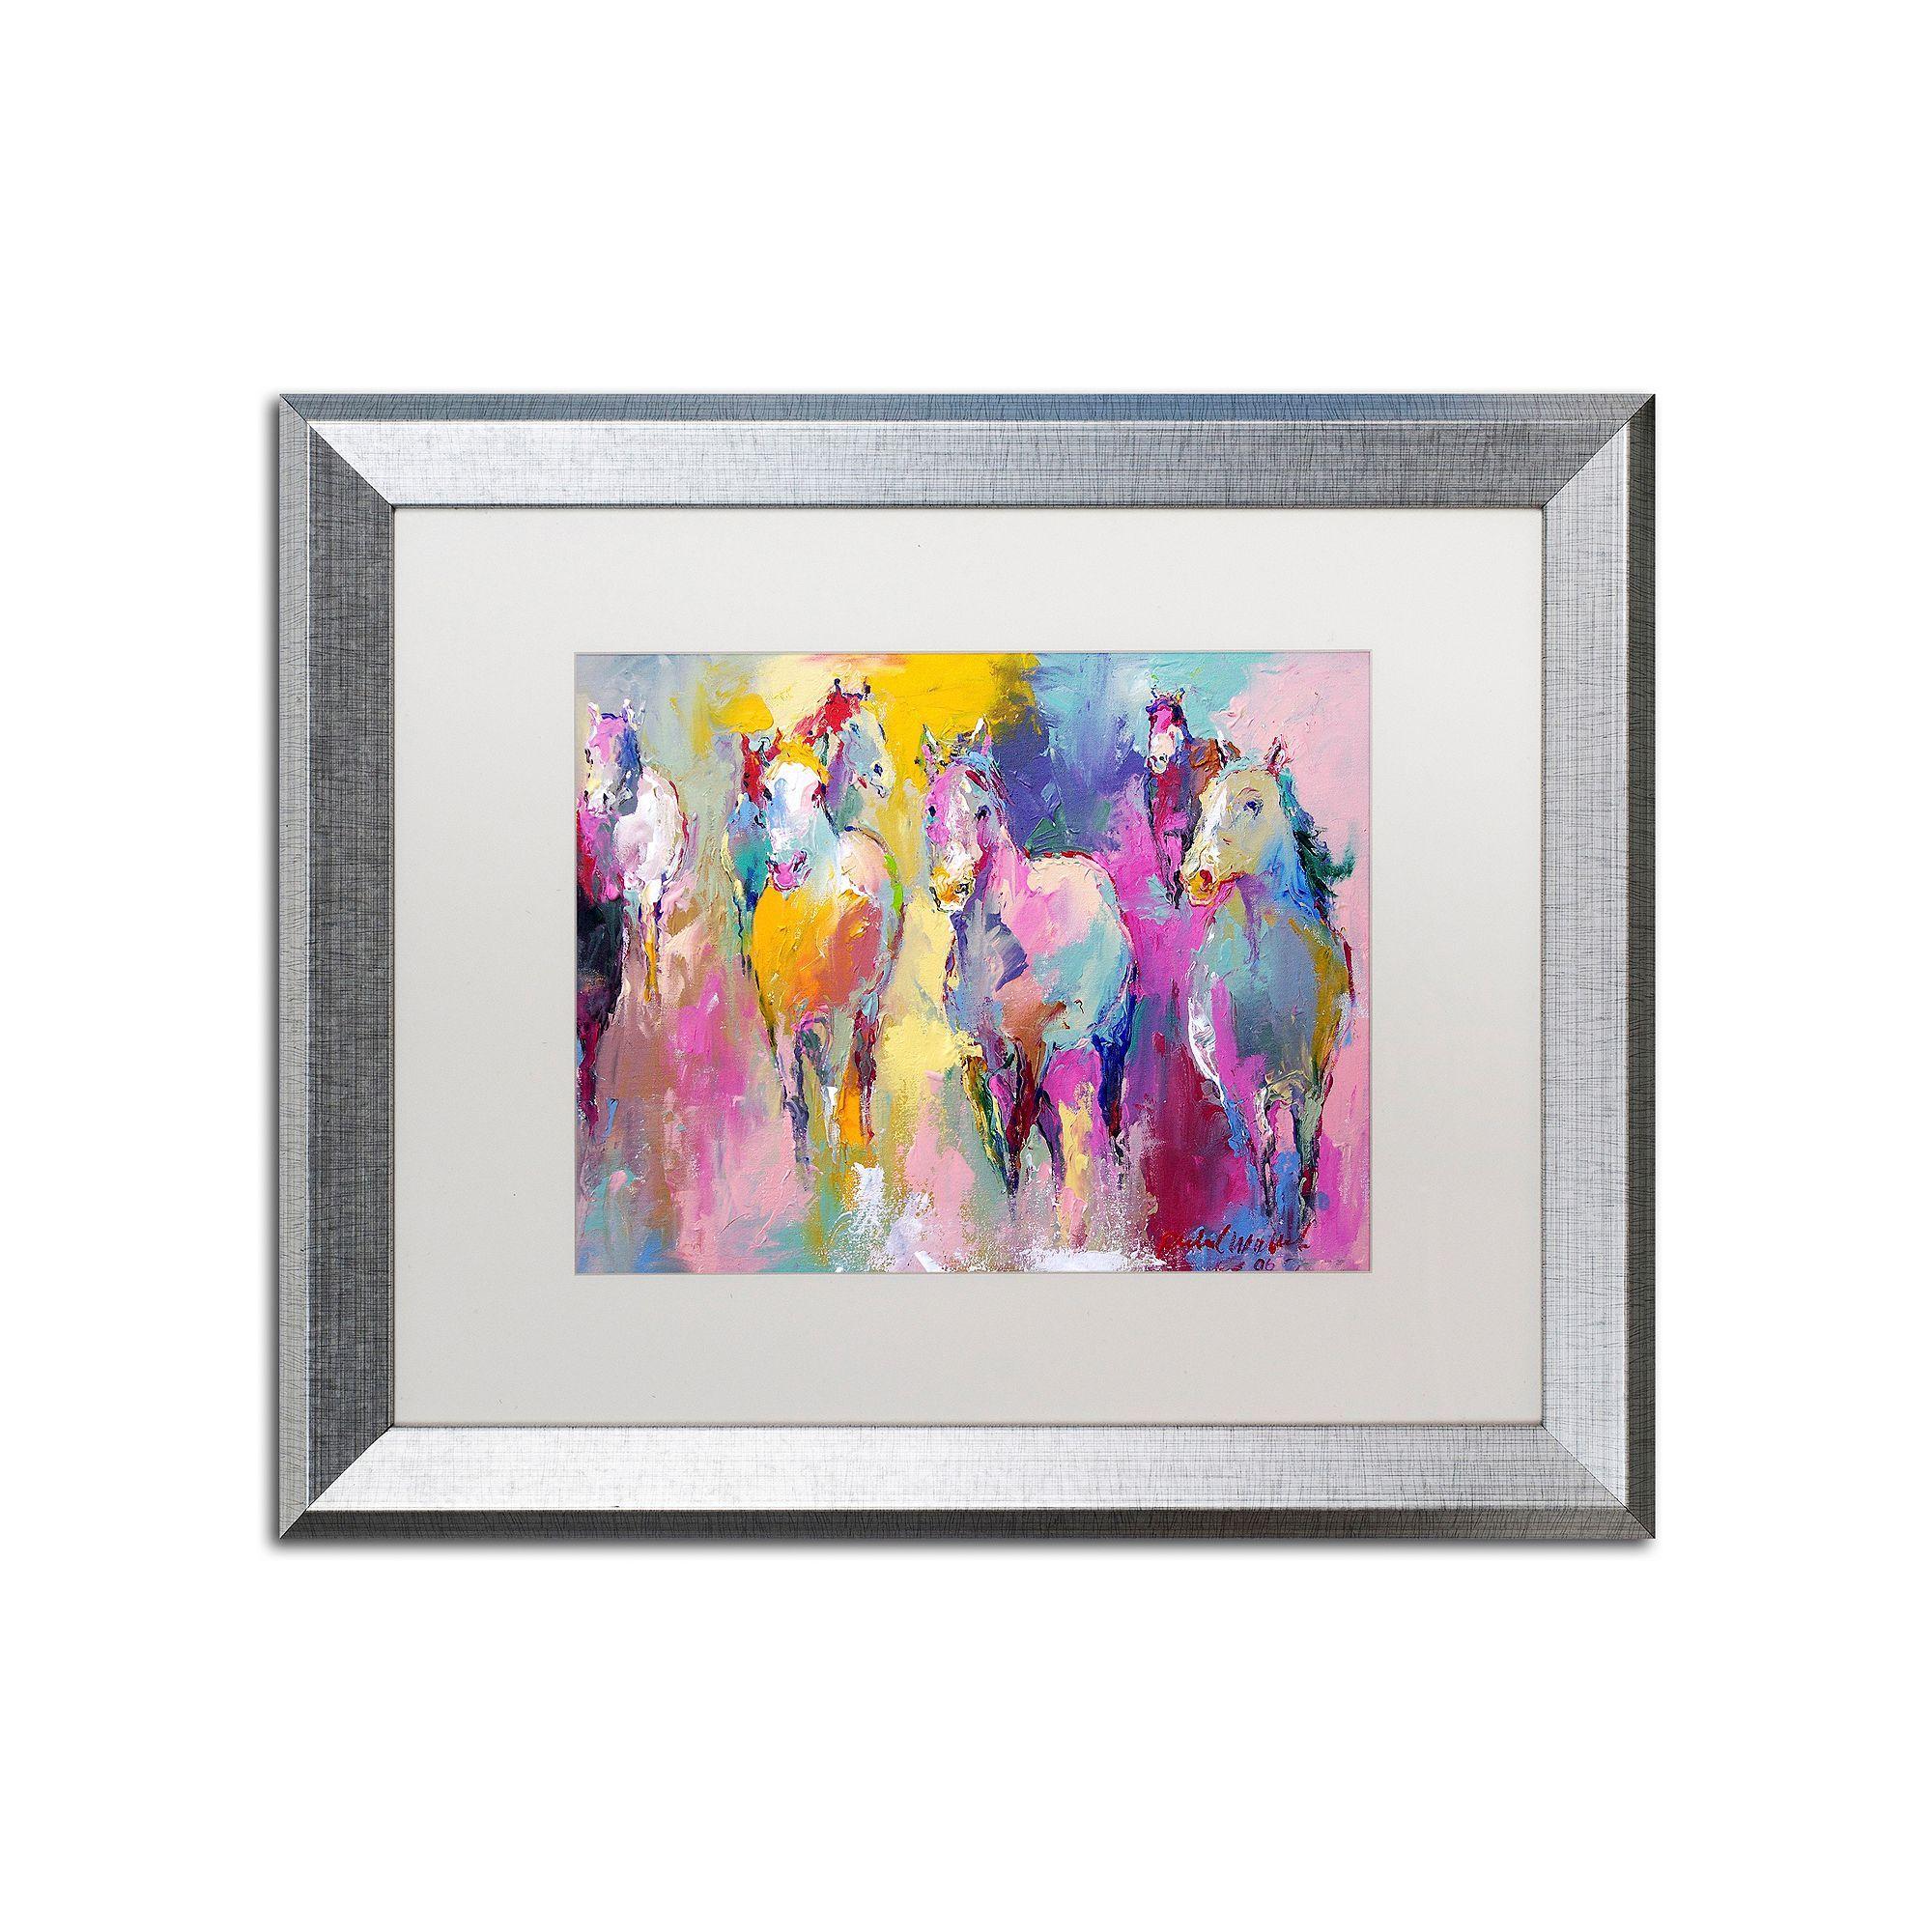 Trademark Fine Art Wild Horse Metallic Framed Wall Art | Products ...